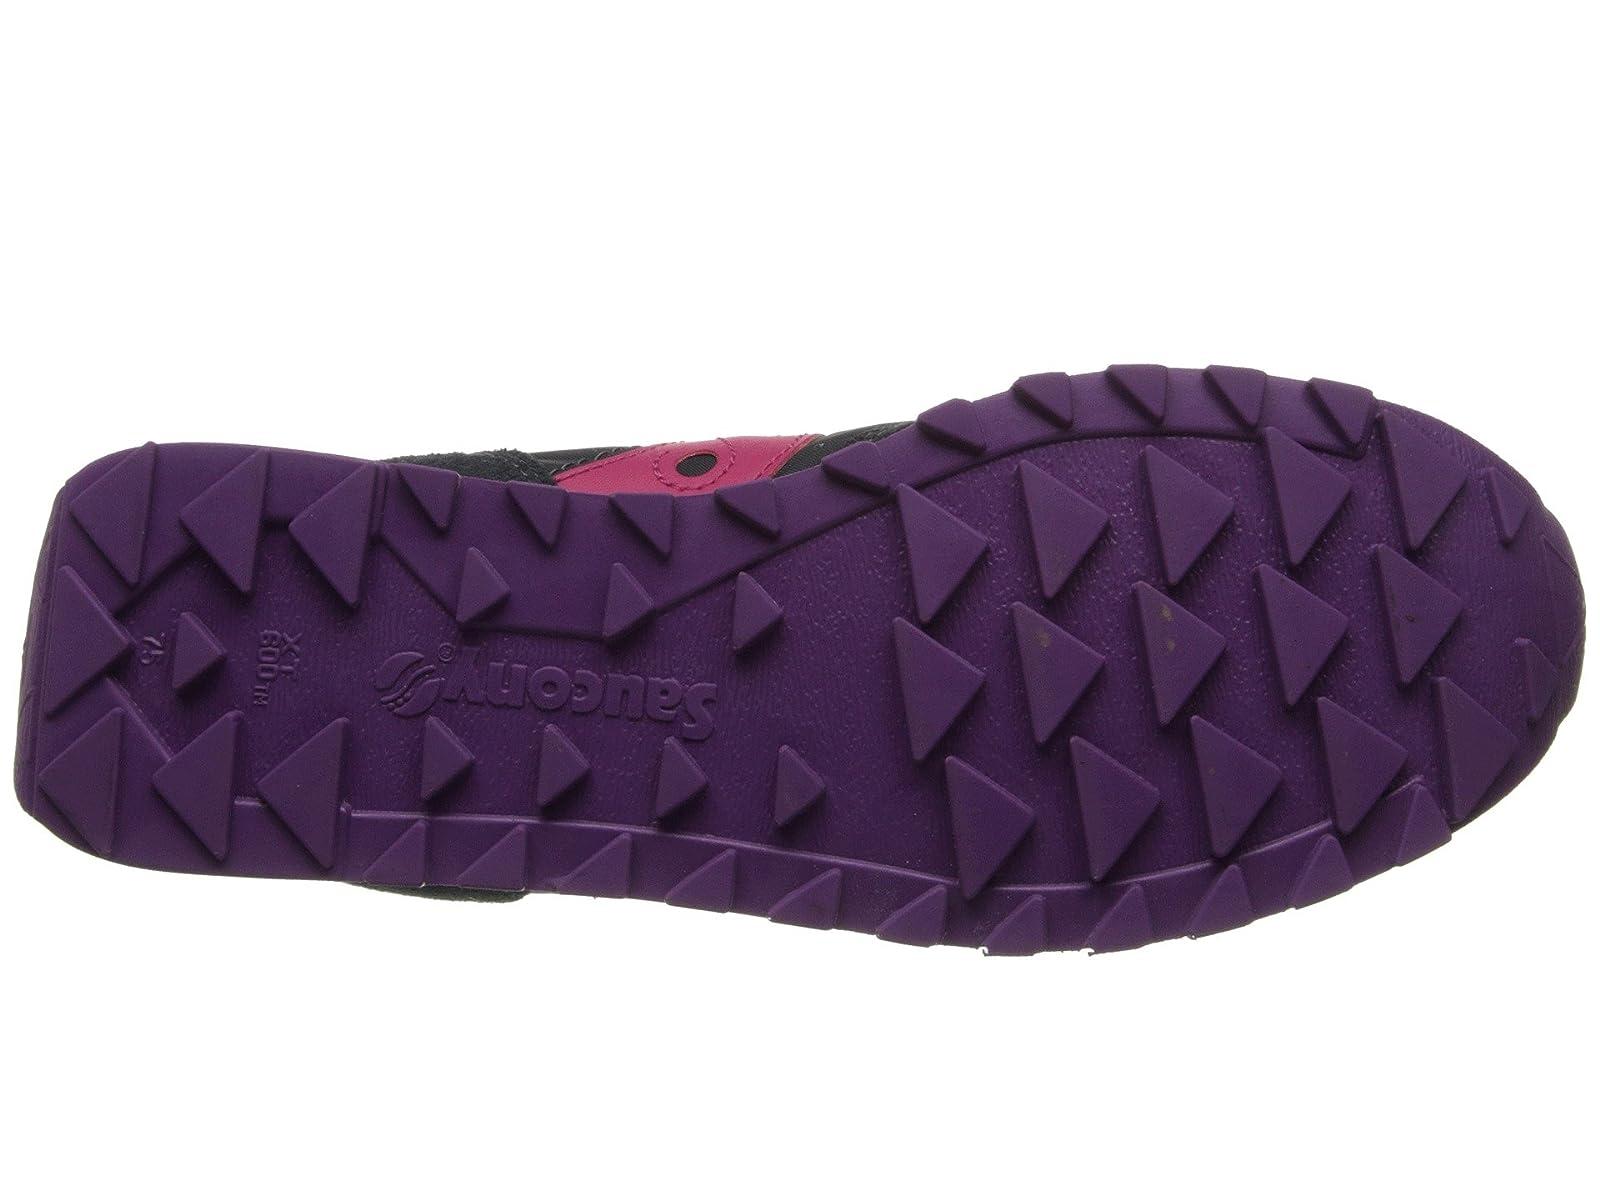 Woman-039-s-Sneakers-amp-Athletic-Shoes-Saucony-Originals-Jazz-Original thumbnail 11